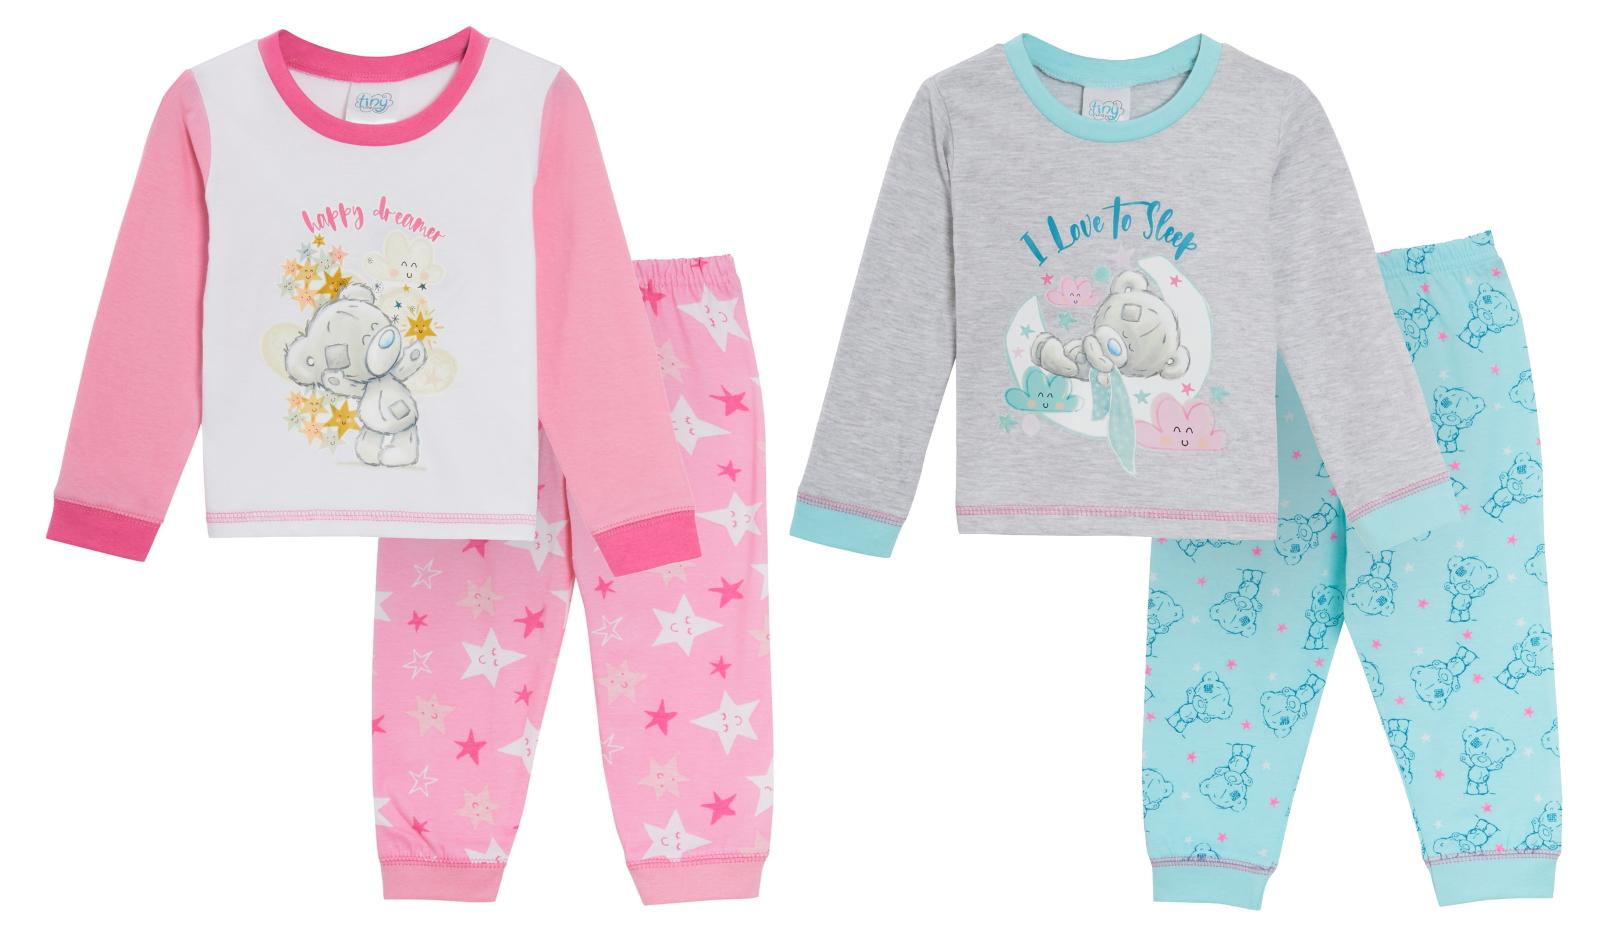 Baby Girls Tatty Teddy Pyjamas Toddlers Pjs Me To You Footless Nghtwear Gift Set